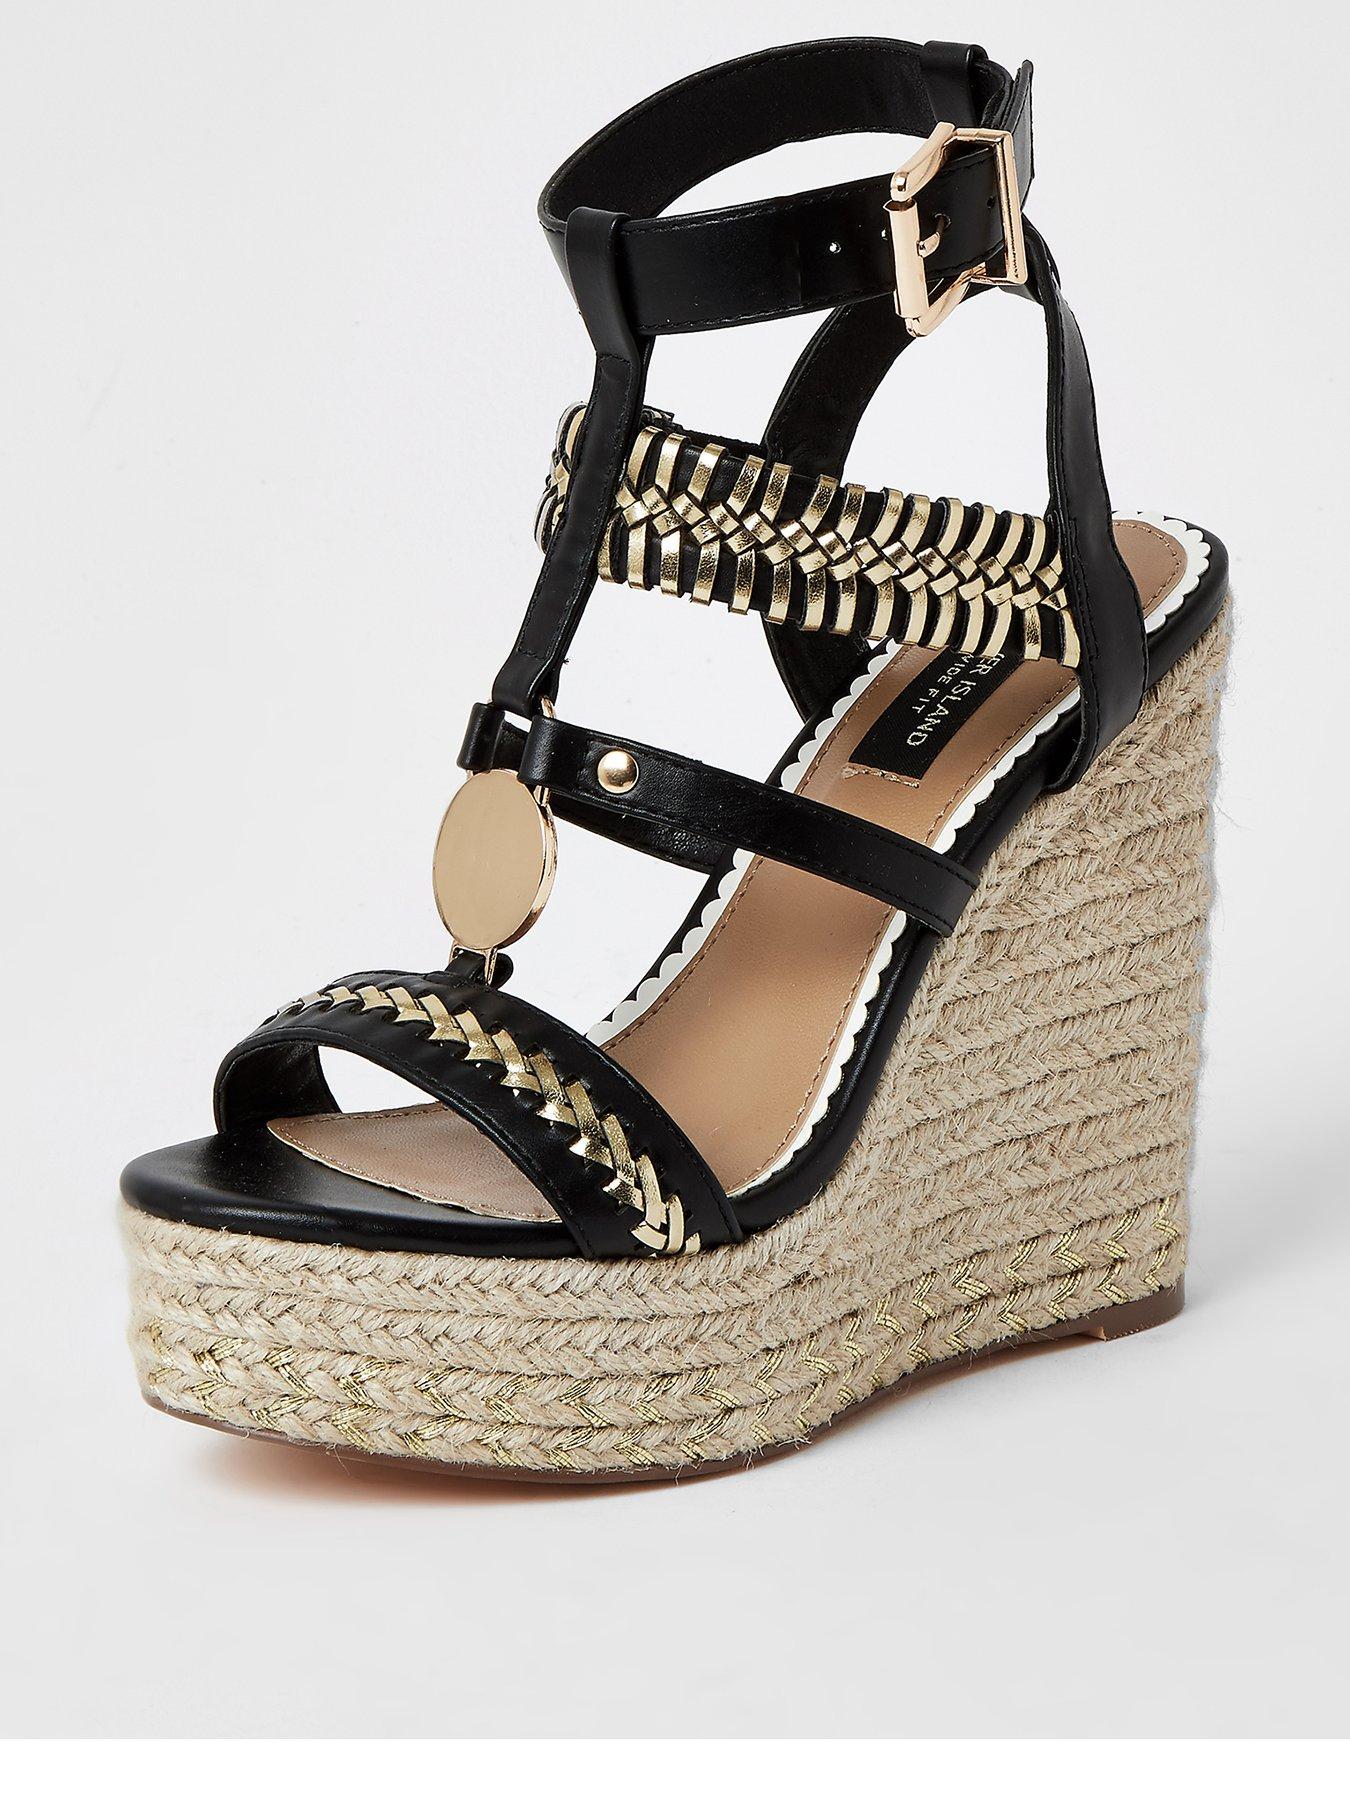 Wide | River island | Shoes \u0026 boots